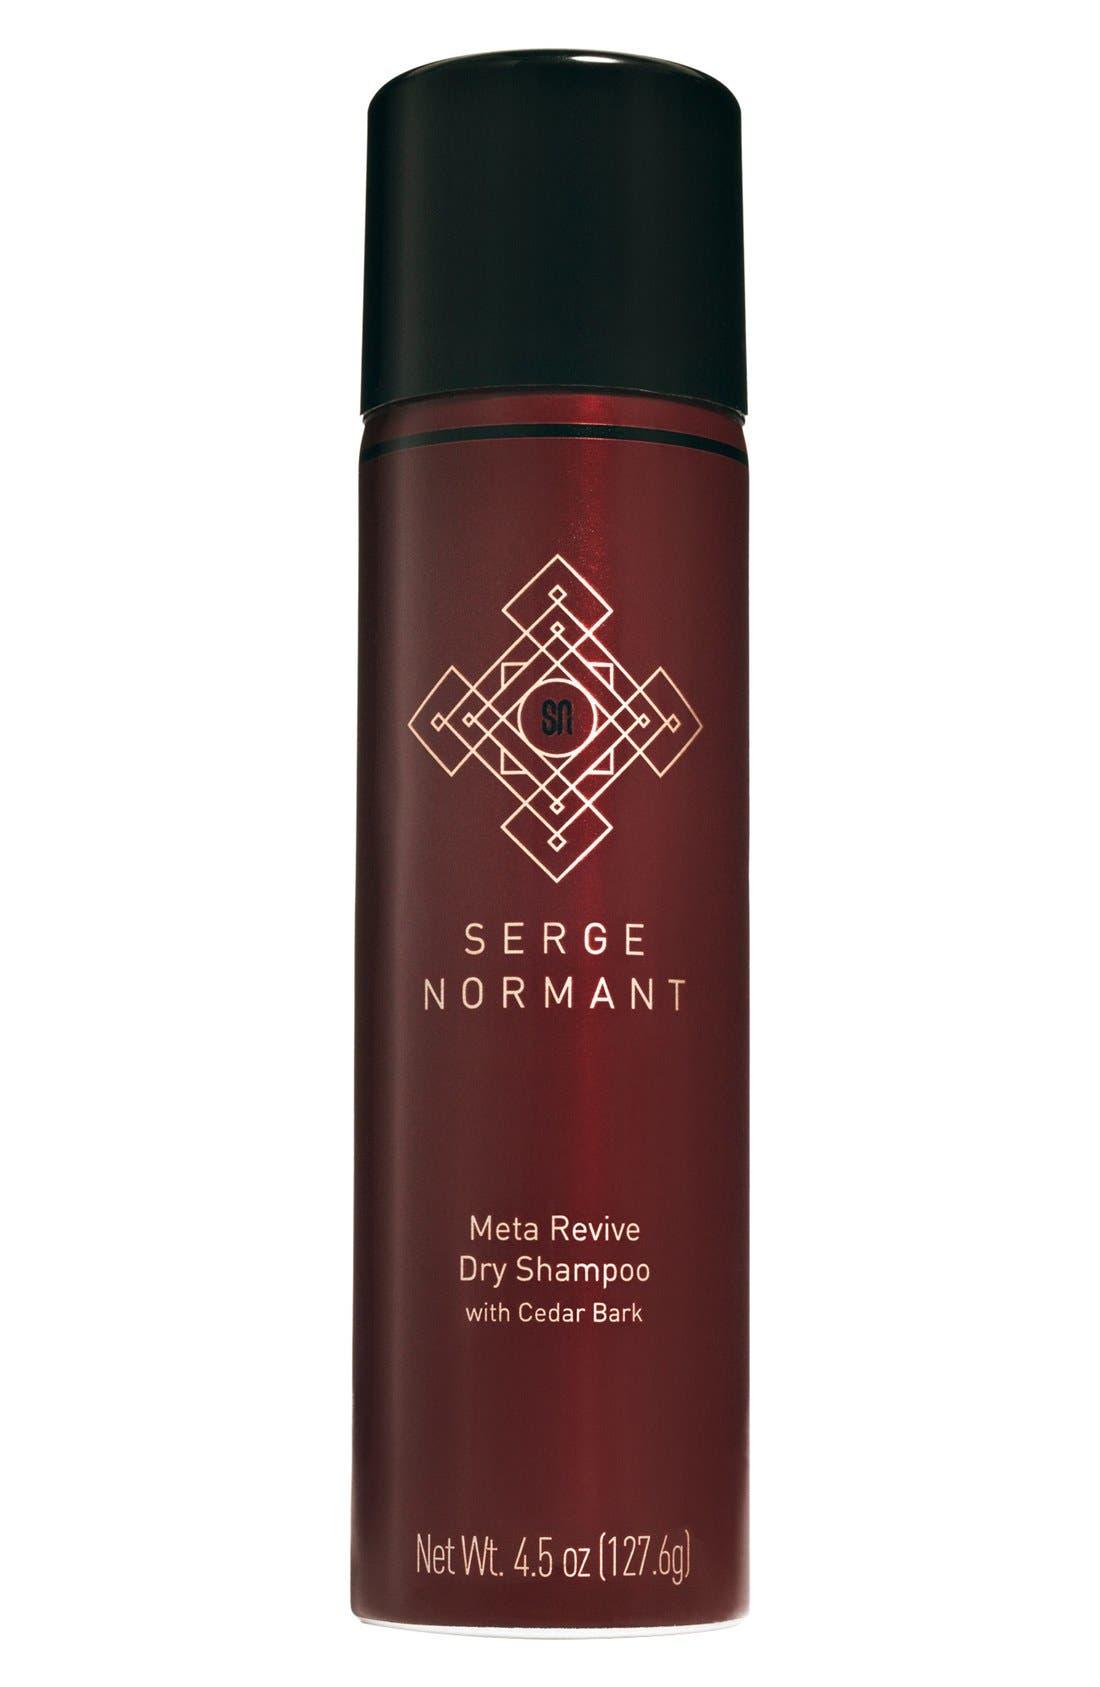 Serge Normant 'Meta Revive' Dry Shampoo